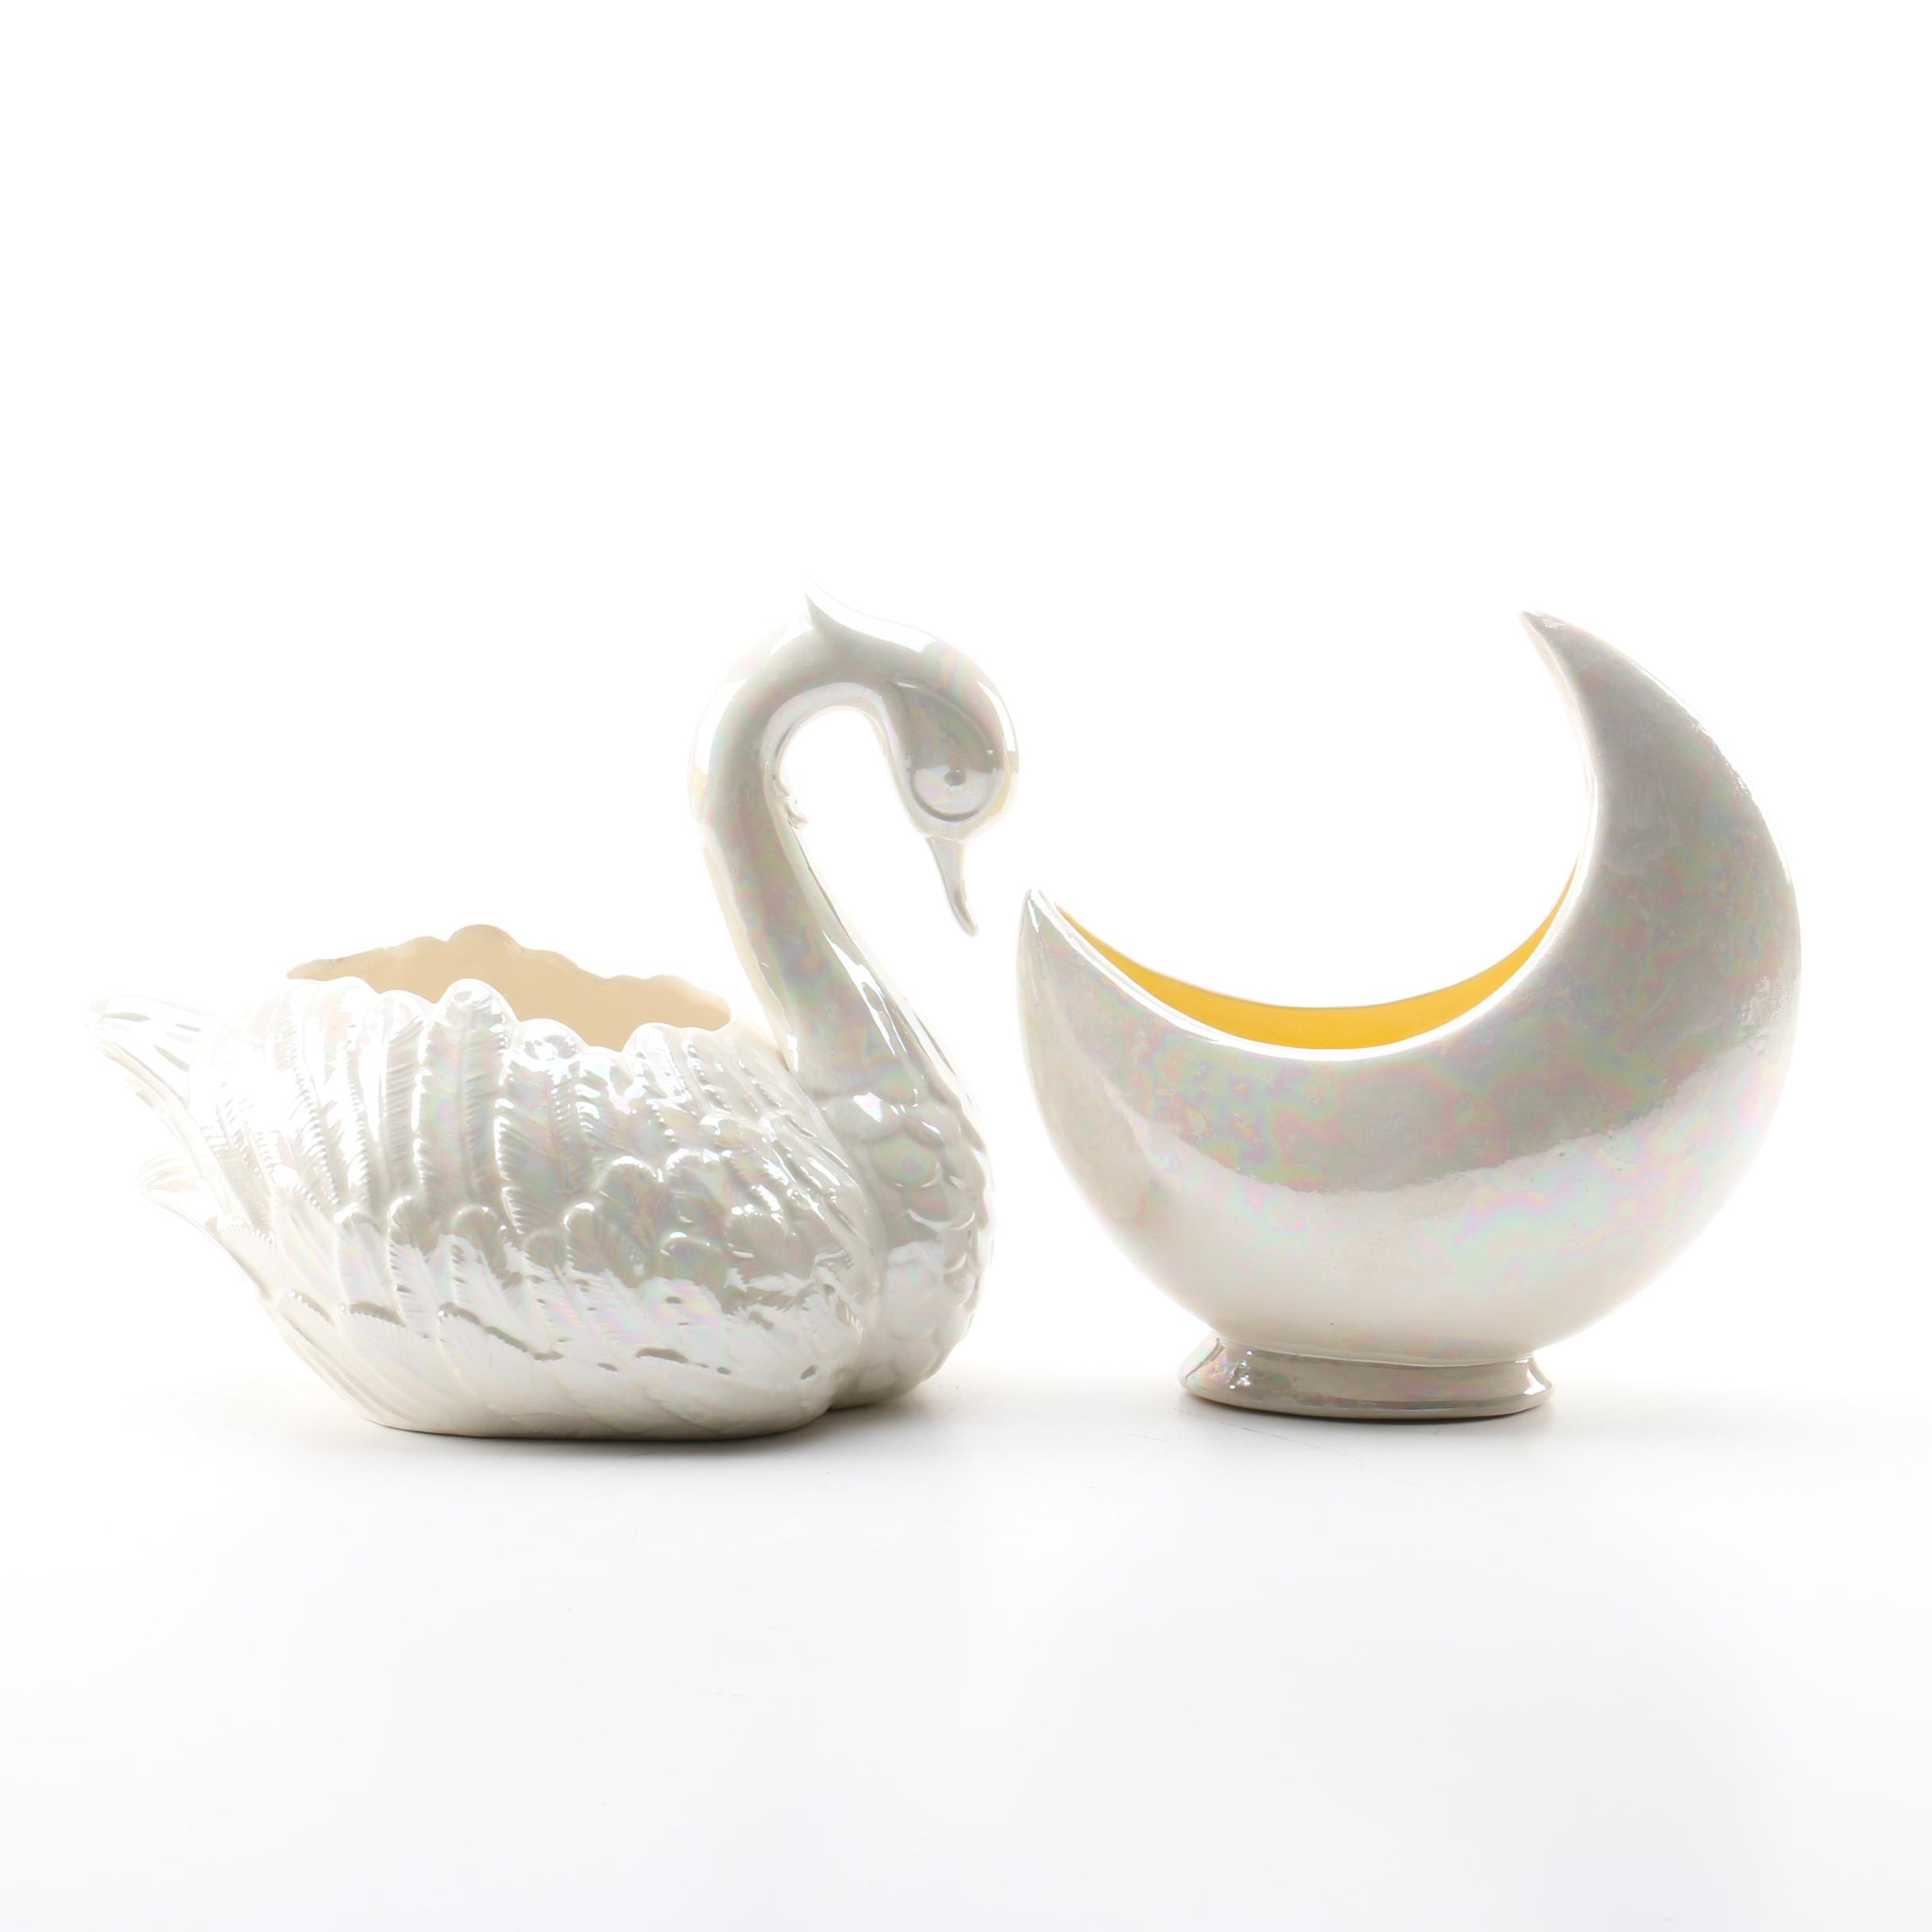 Opalescent Finished Figurative Ceramic Planters